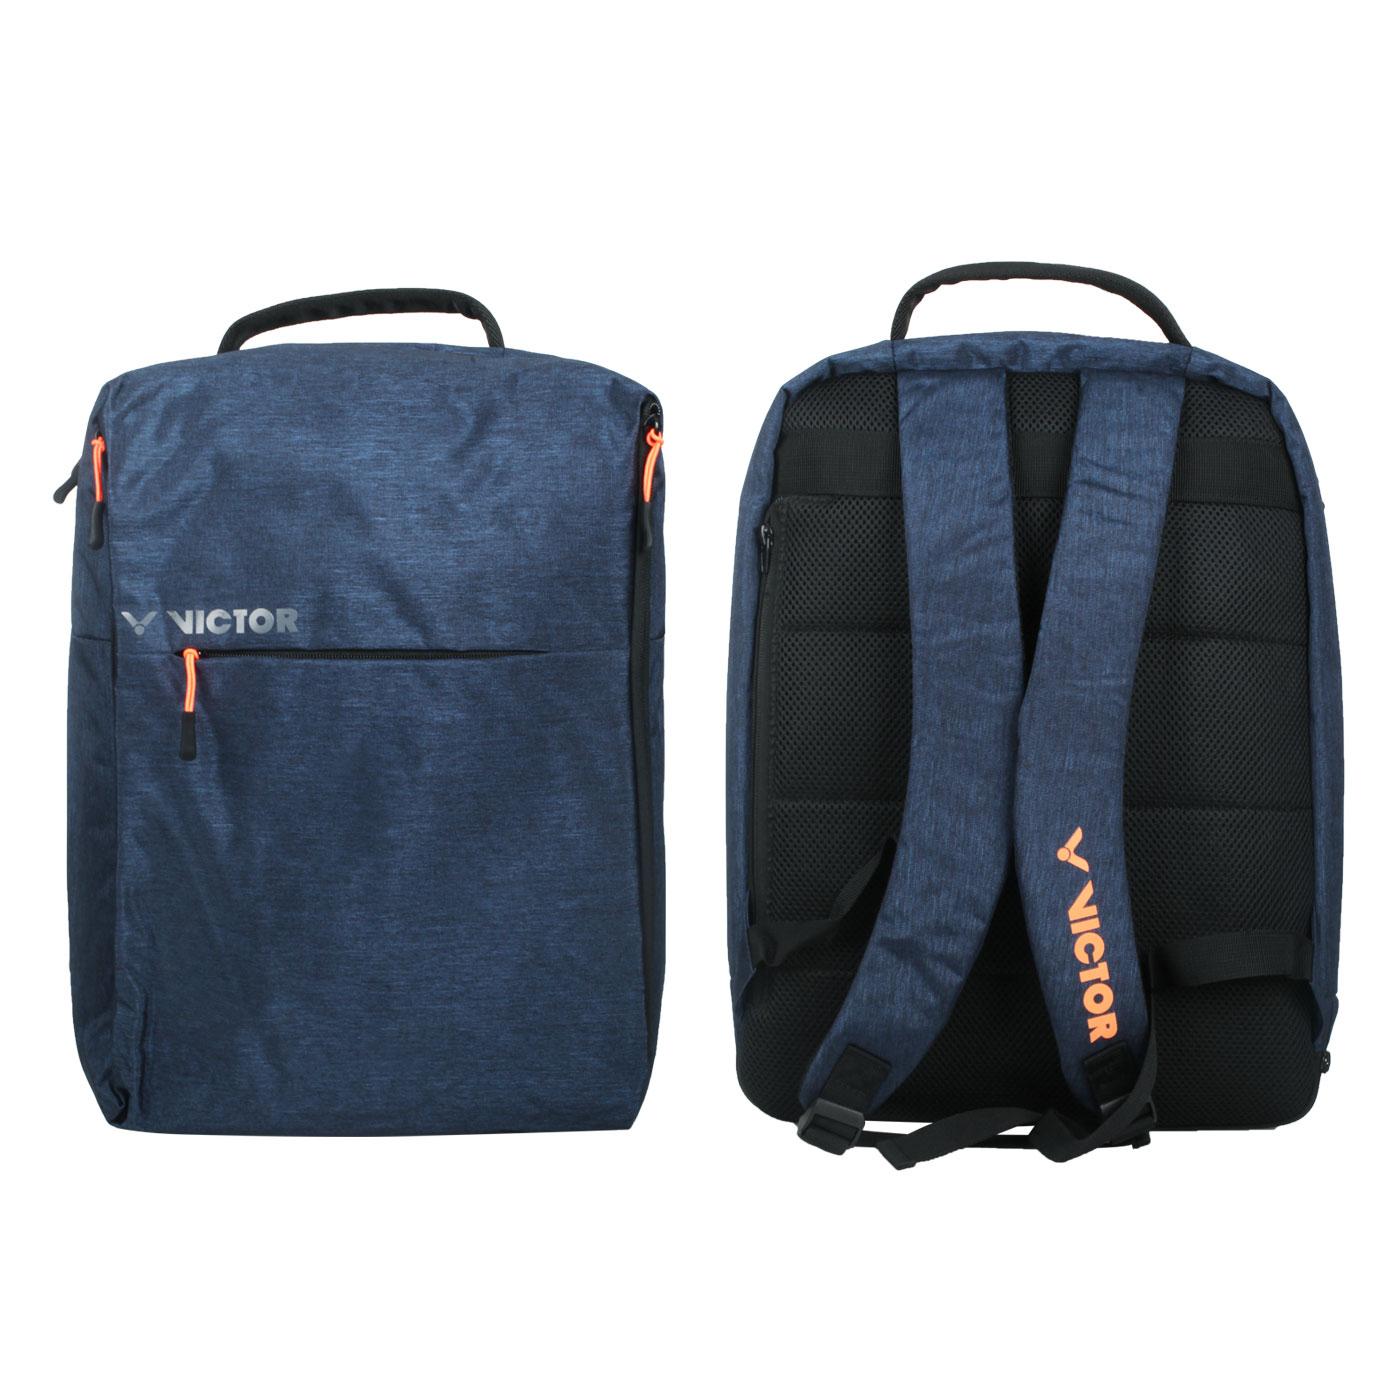 VICTOR 後背包 BR3022B - 深藍橘